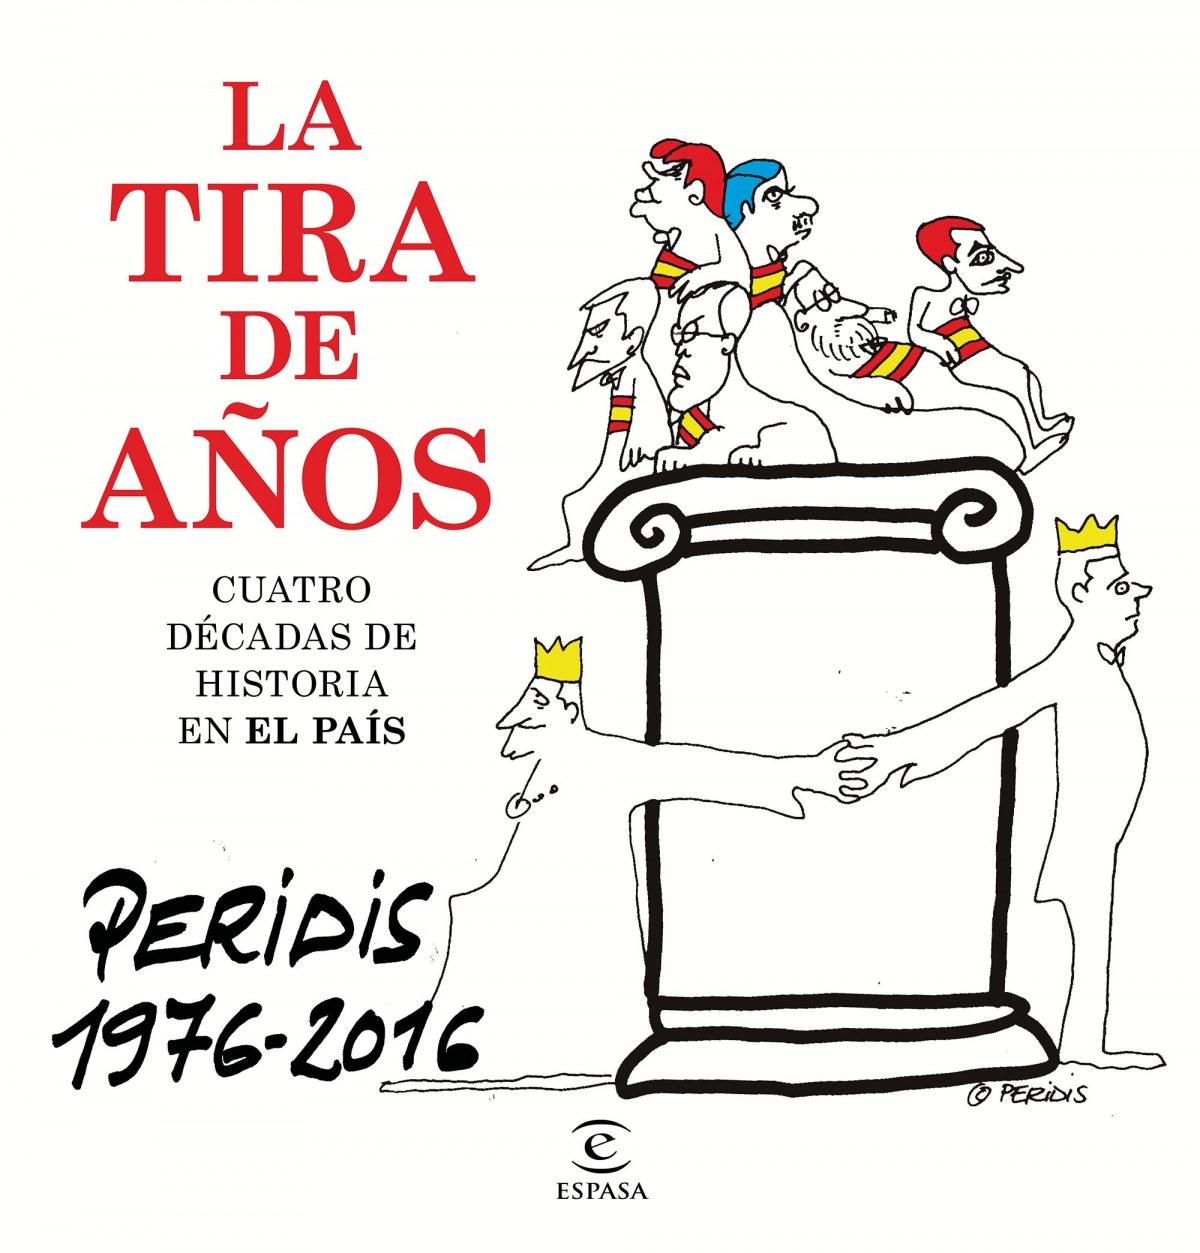 LA TIRA DE AñOS PERIDIS 1976-2016 9788467048919